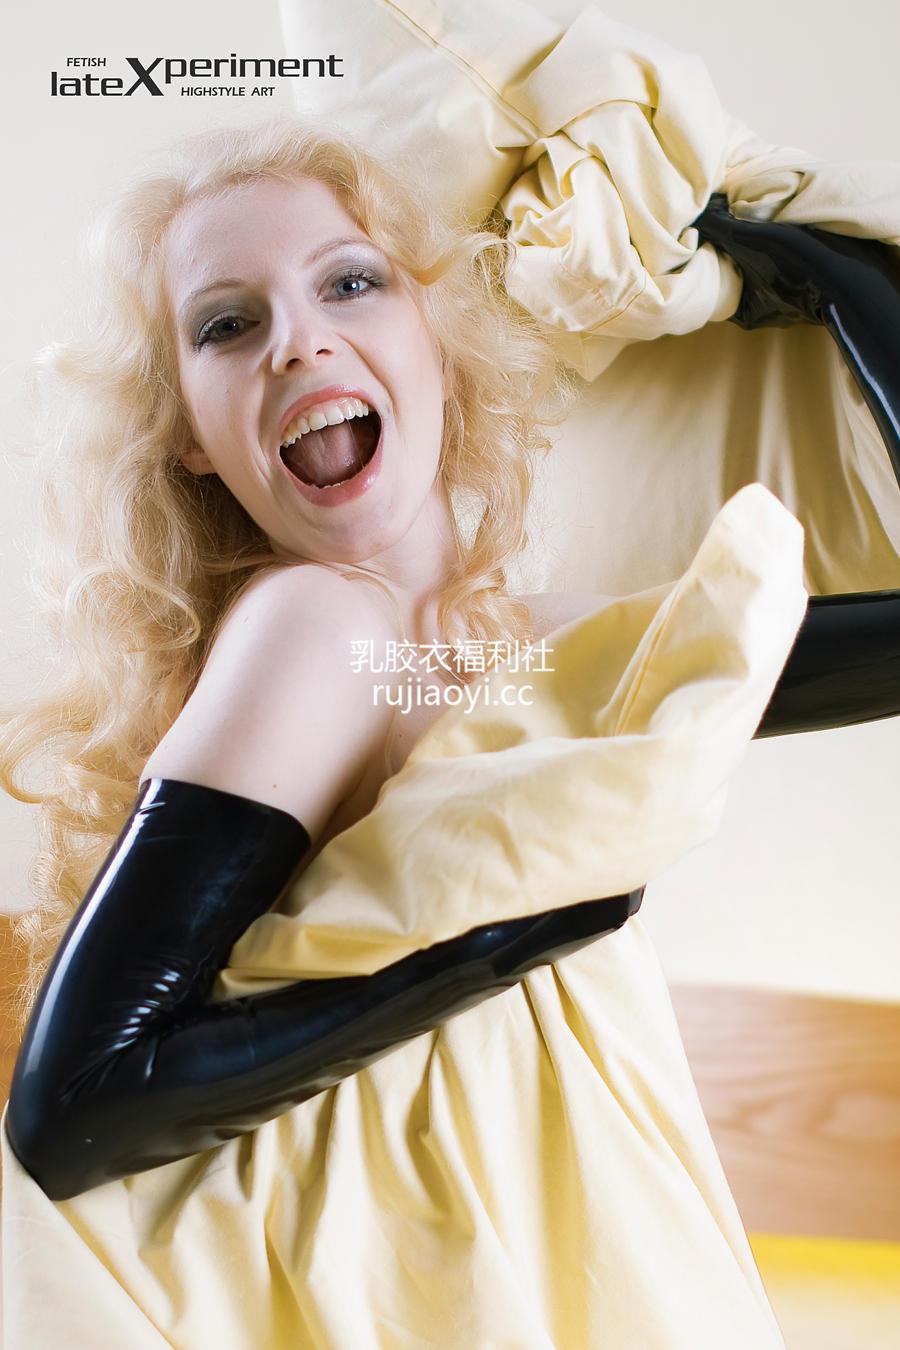 [LateXperiment] 金发少女半裸大尺度乳胶手套床上写真